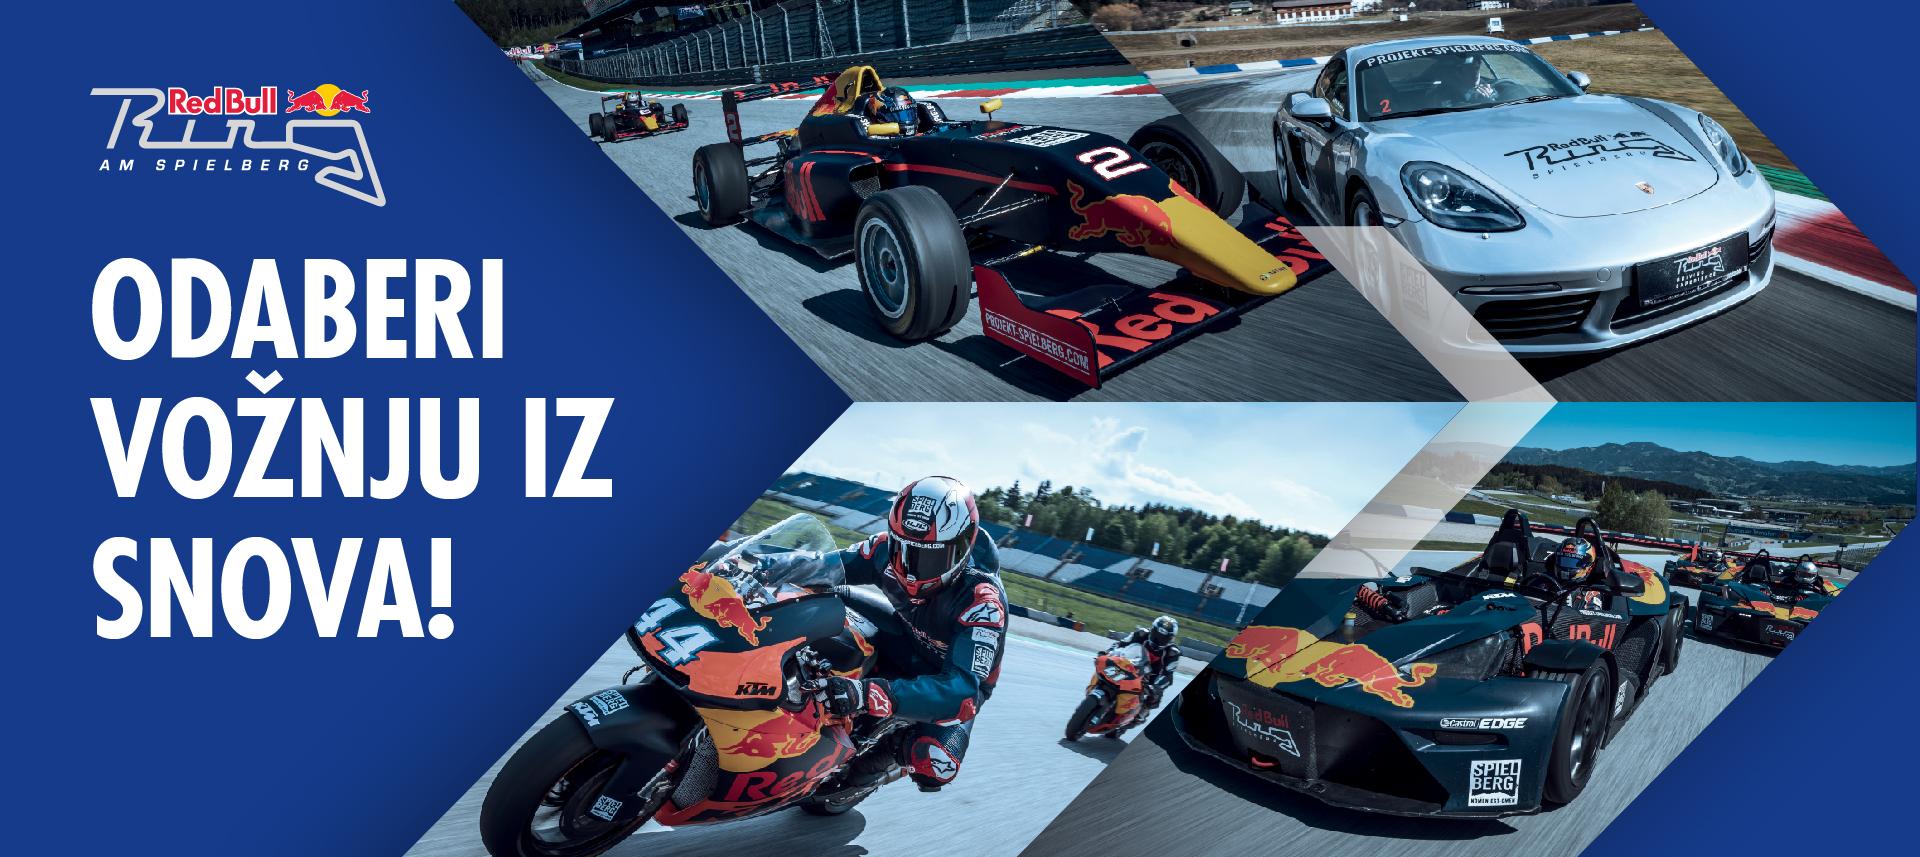 RB_Motorsport_1920x857_2021-01.jpg